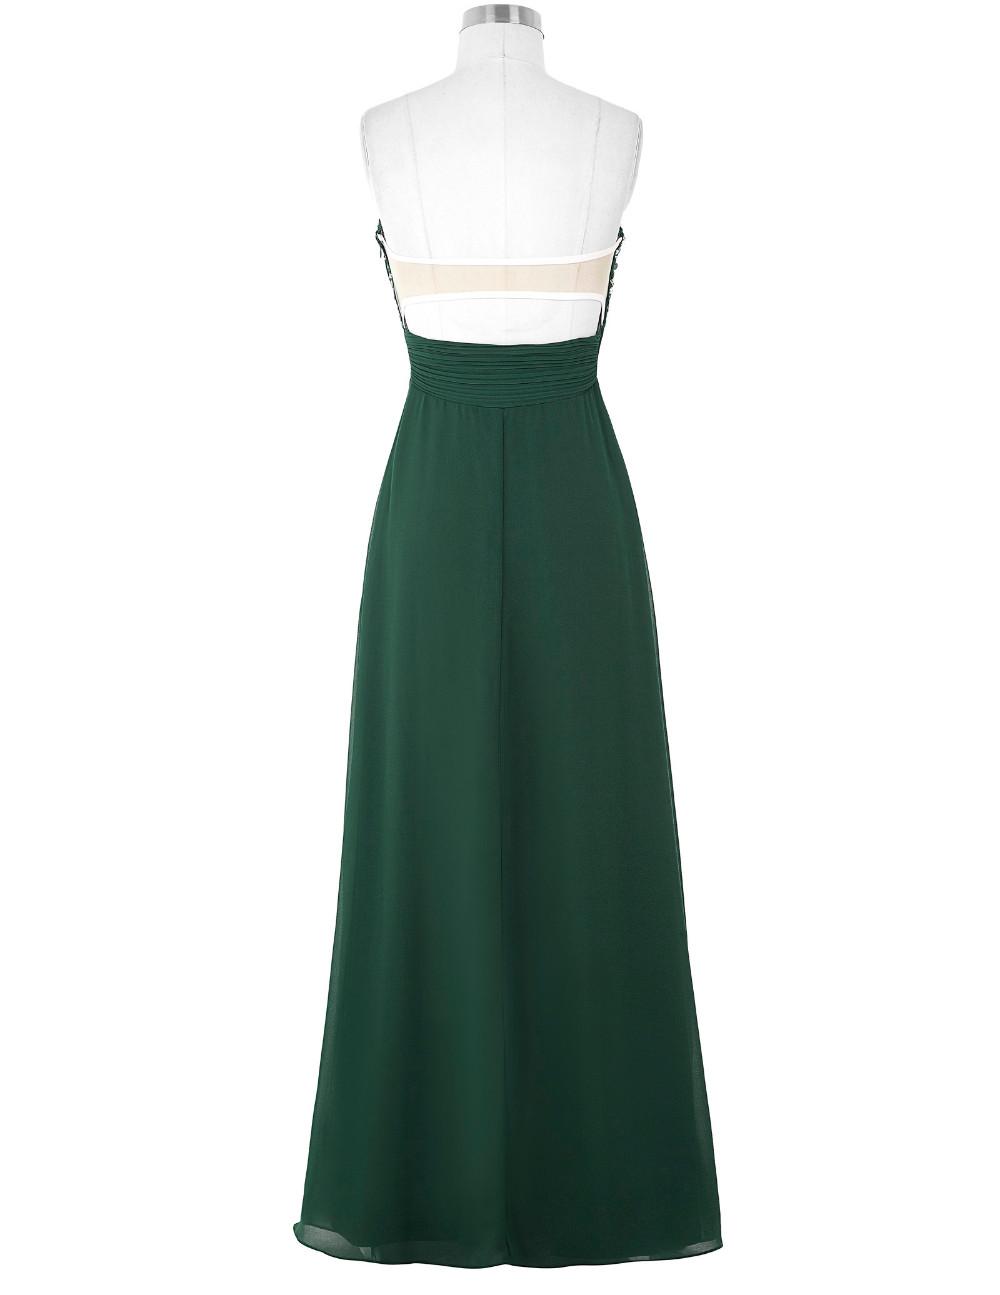 Lavender Green Blue Bridesmaid Dresses Long Wedding Party Dress Bruidsmeisjes Jurk Chiffon Gelinlik Prom Dresses for Bridesmaids 10